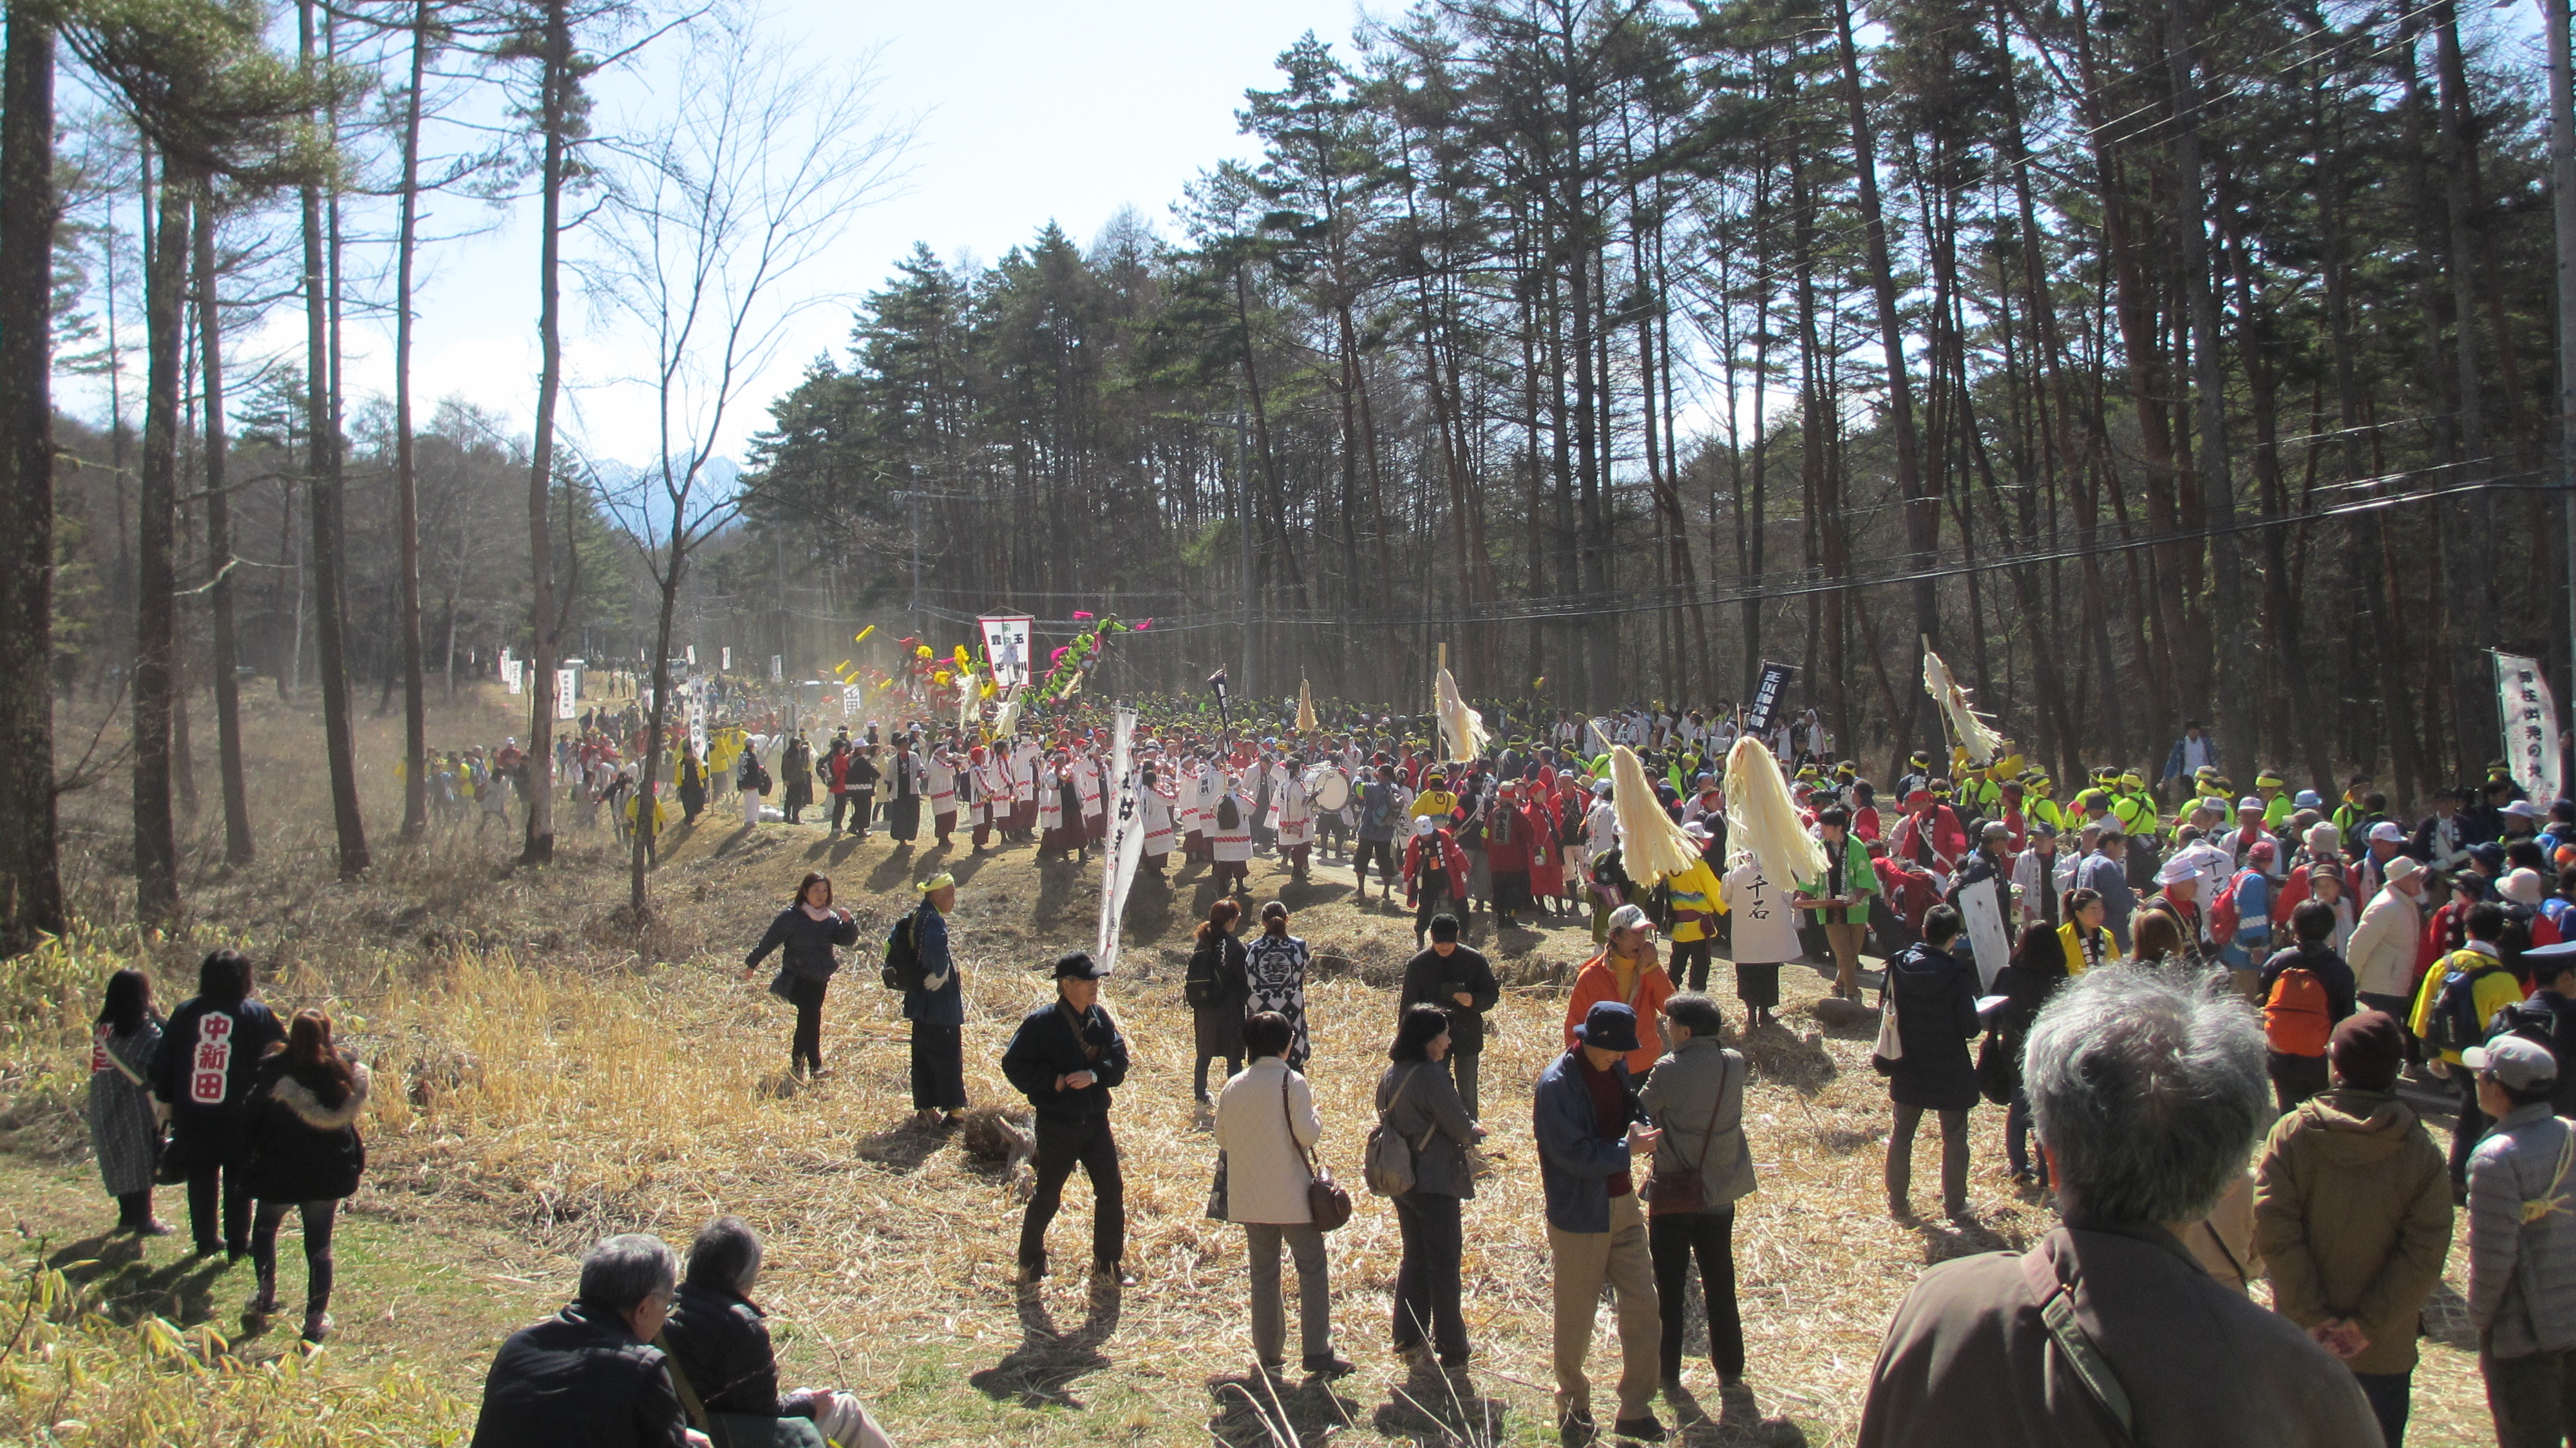 http://www.alpico.co.jp/shikinomori/news/images/IMG_5749.JPG